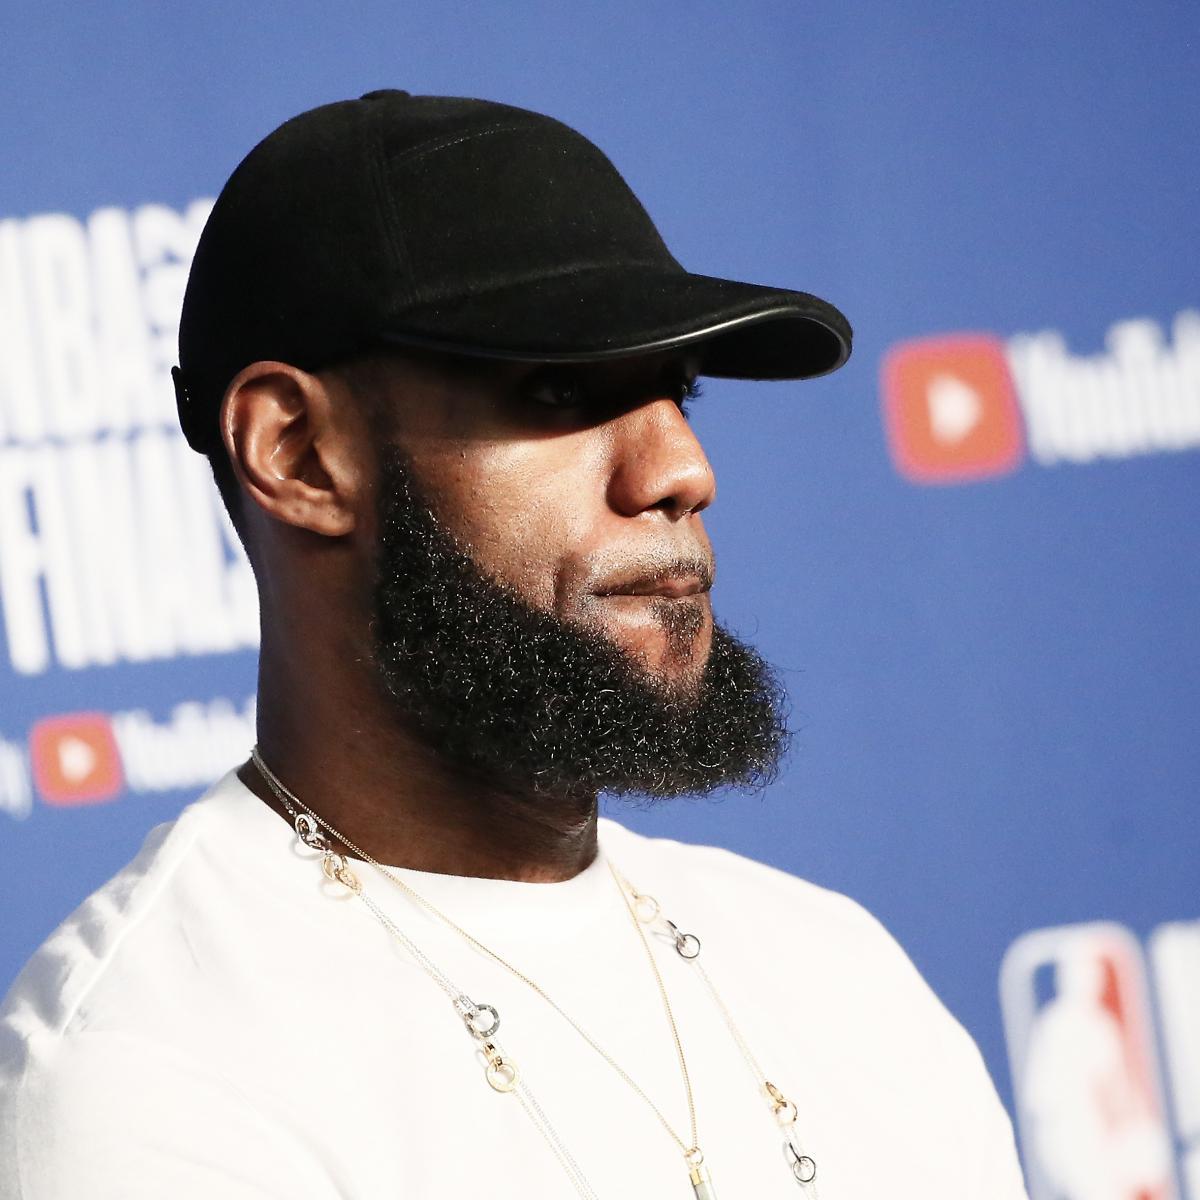 NBA Free Agents 2018: LeBron James, DeMarcus Cousins, More Rumors, Predictions